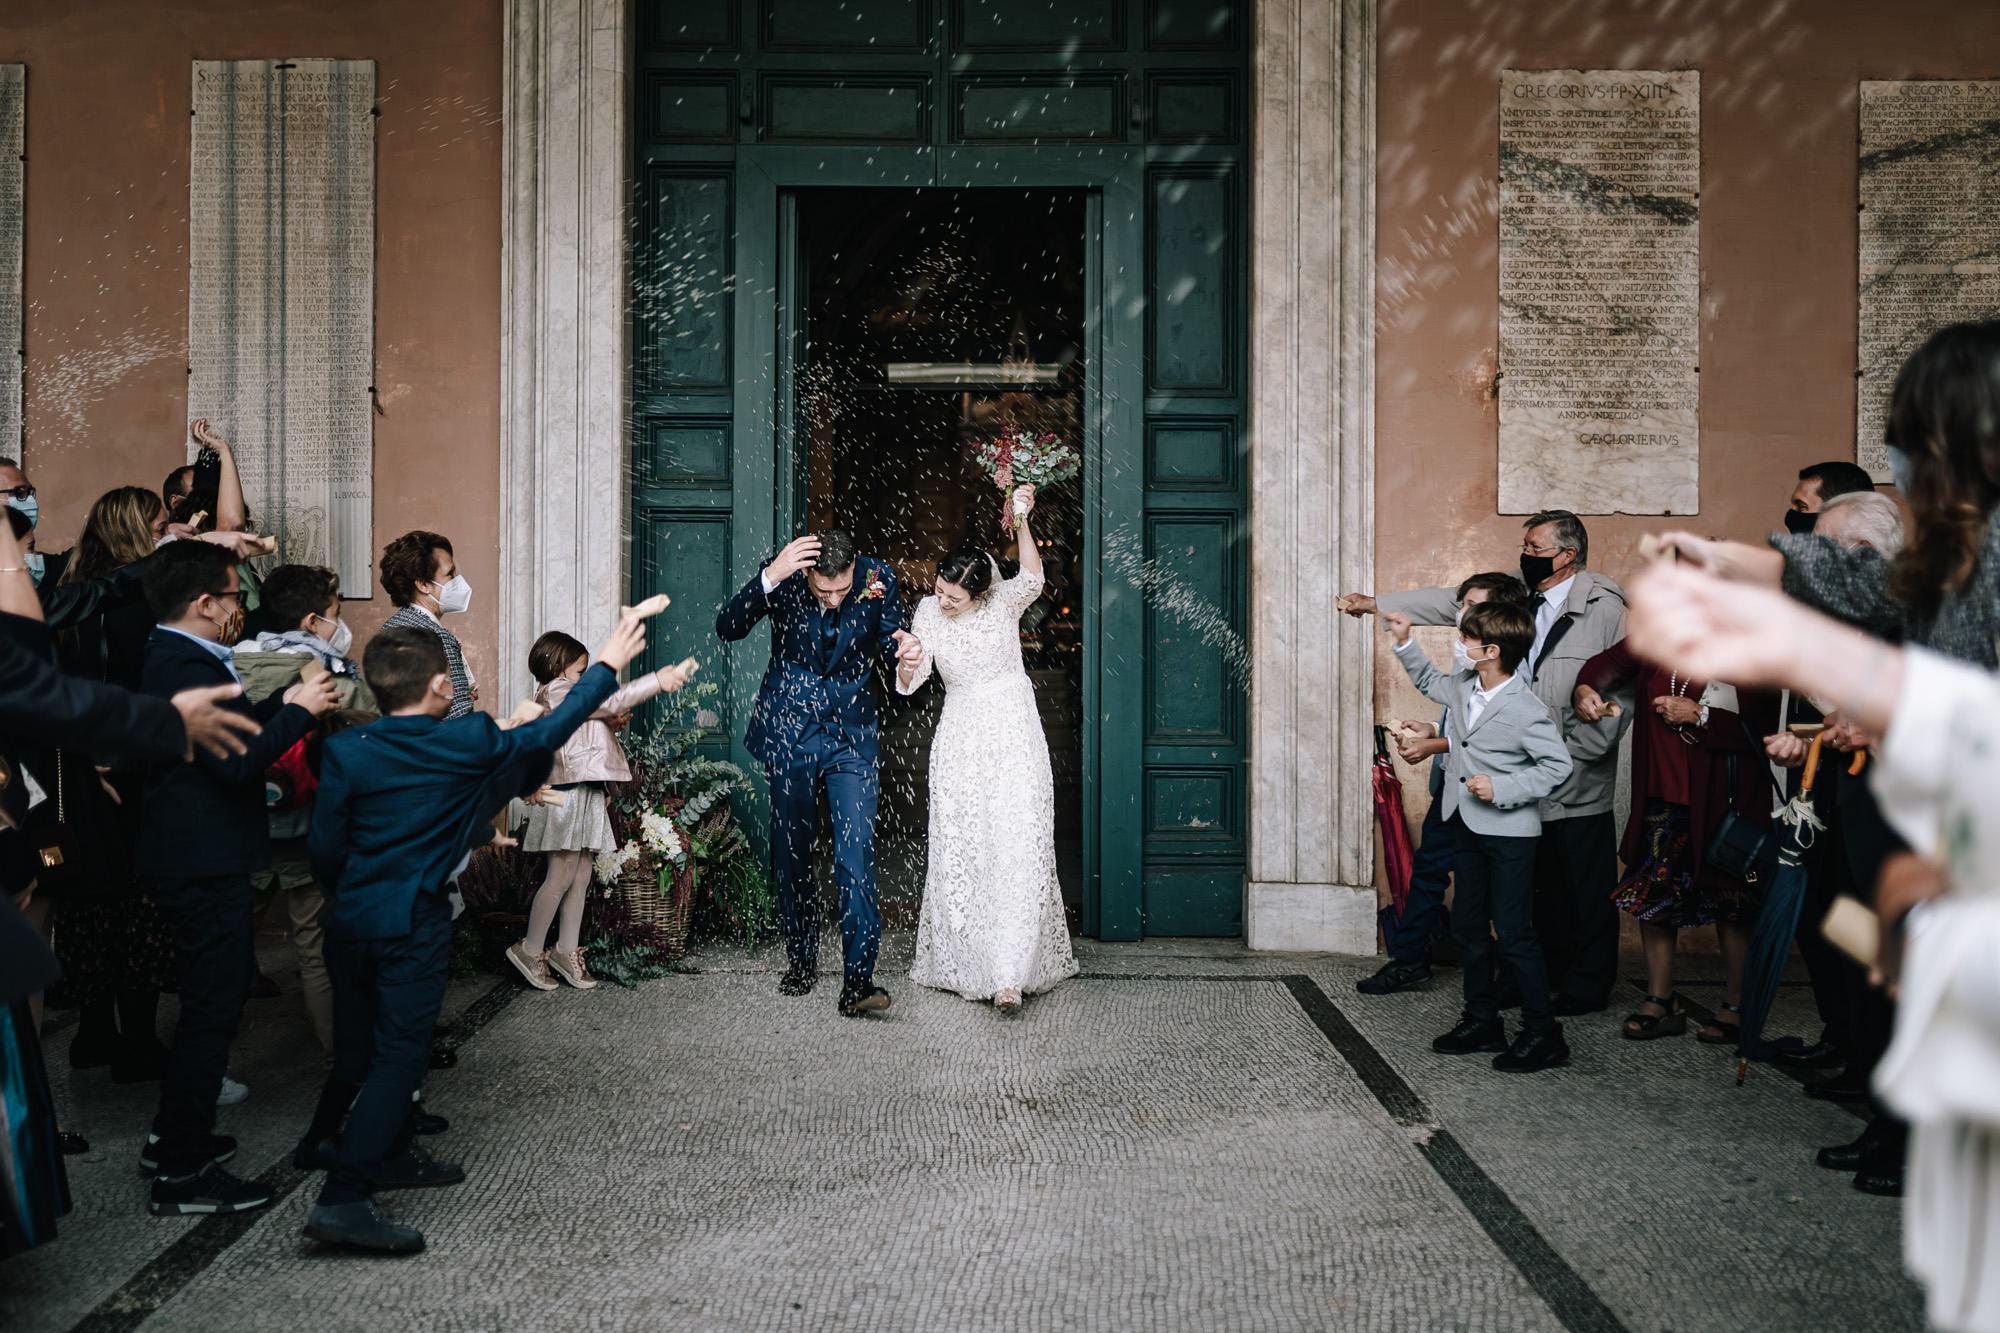 lancio del riso matrimonio